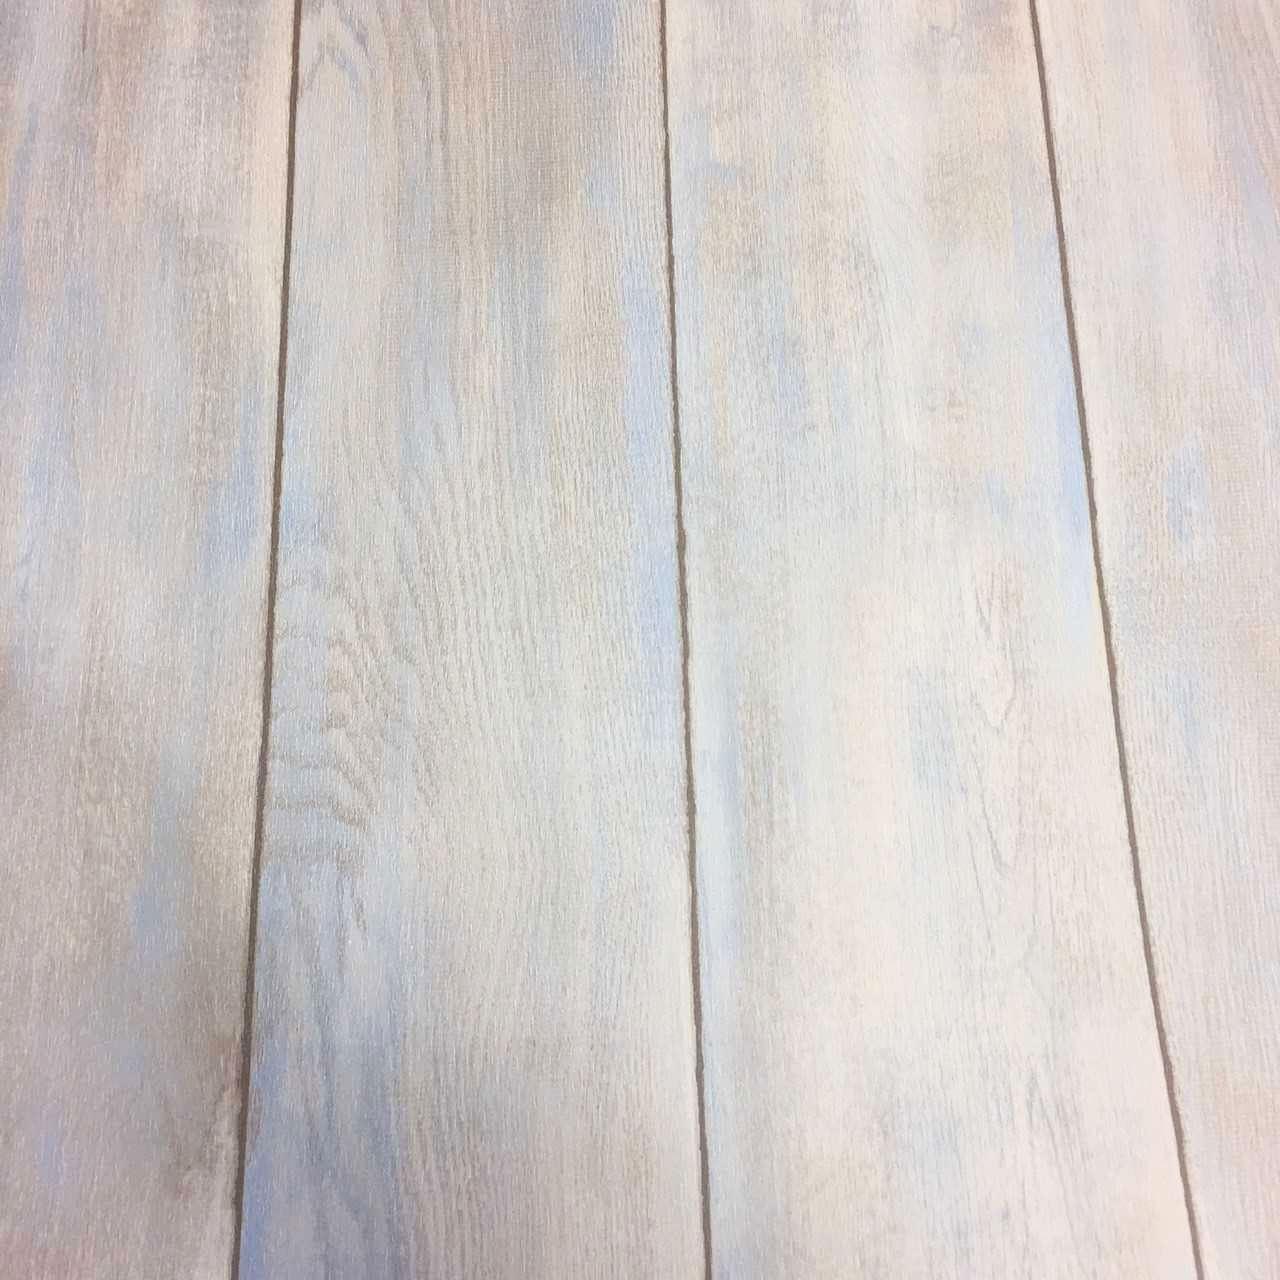 Wood-Effect-Wallpaper-Grains-Boards-Planks-Paste-The-Wall-Vinyl-Koziel-3-Colours thumbnail 3